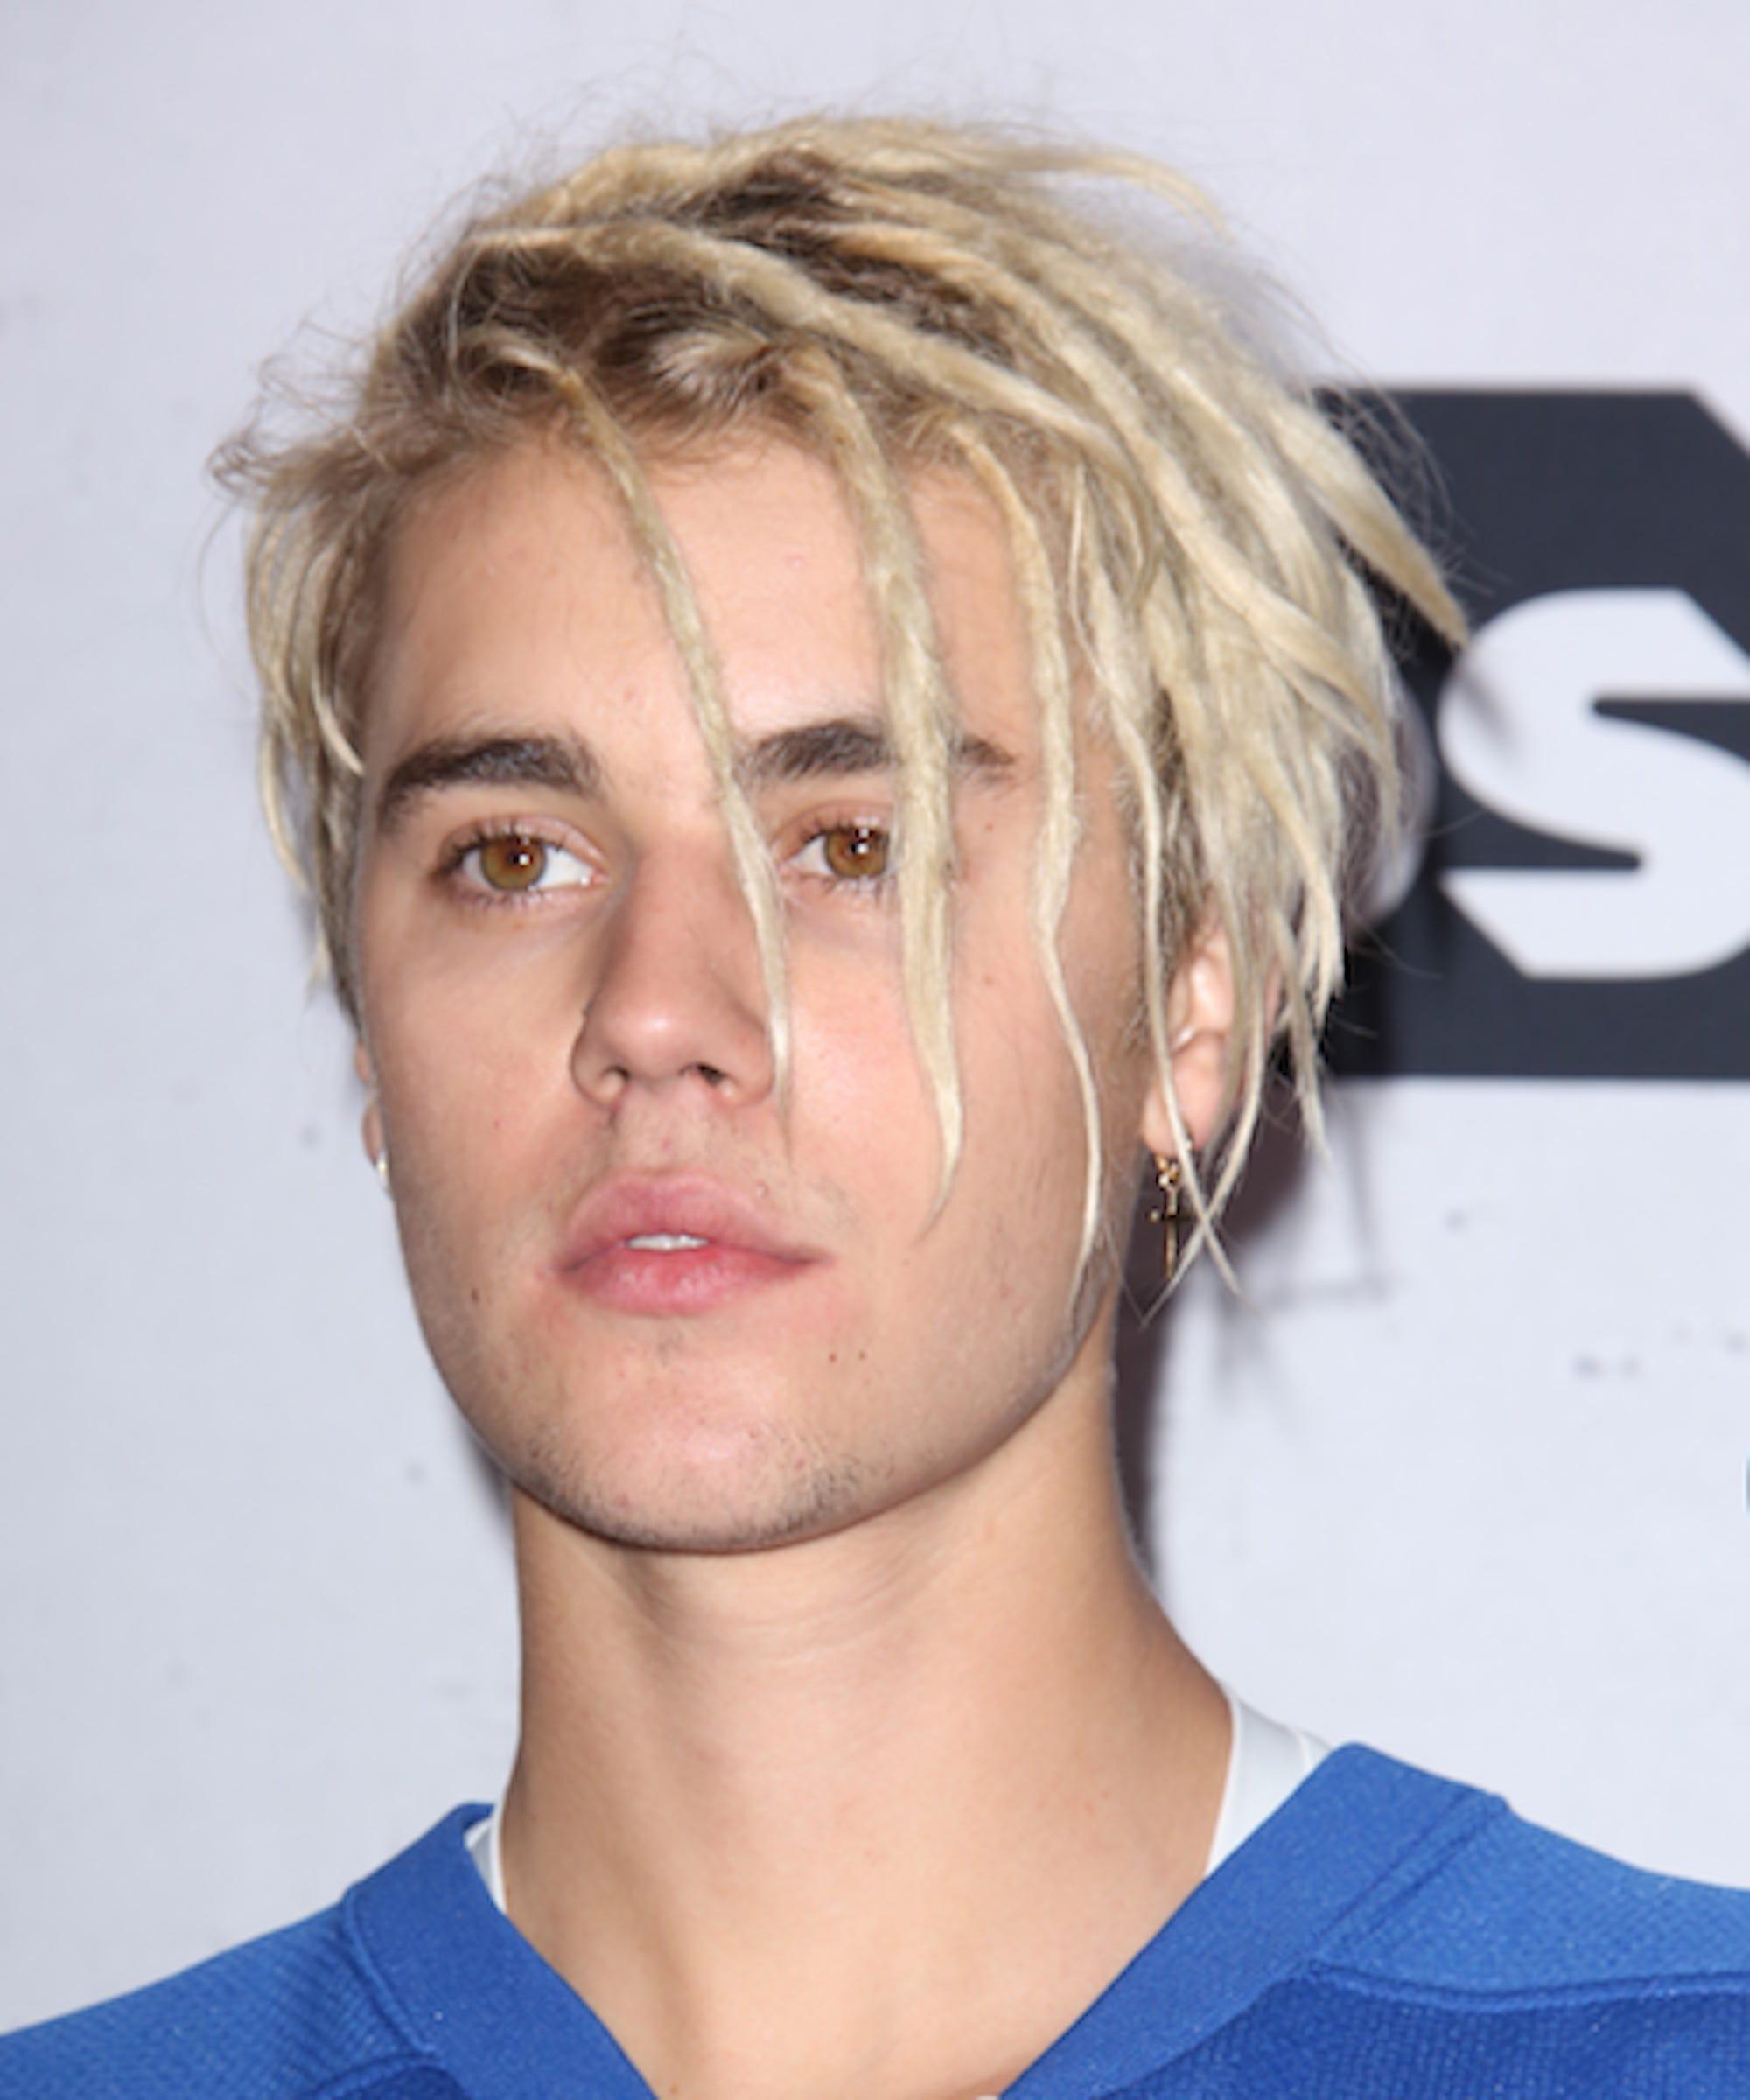 Justin Bieber Hair Dreadlocks Backlash